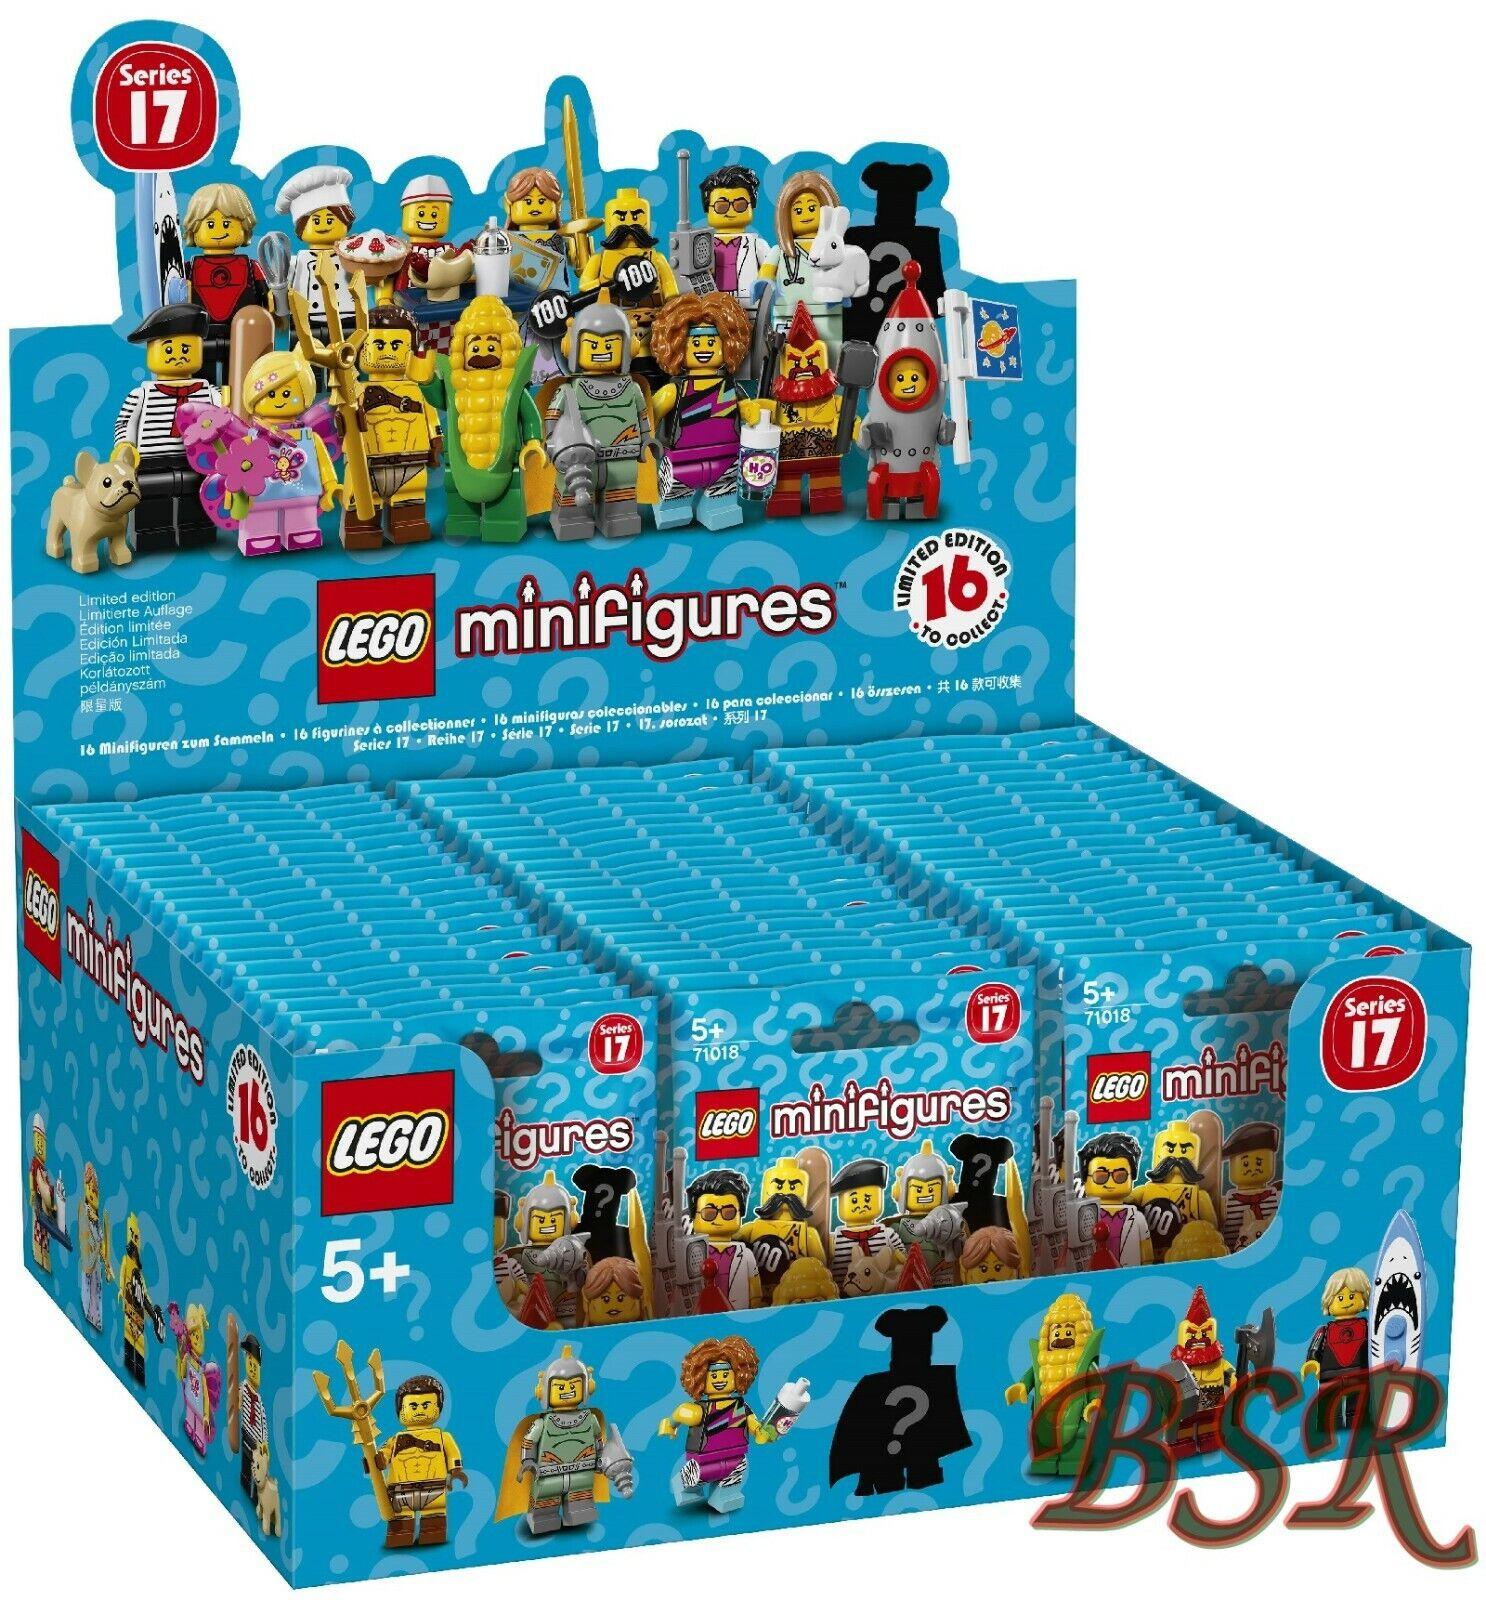 71018 LEGO ® complet scellée Display 60 pochettes série 17 & 0. - livraison NEUF